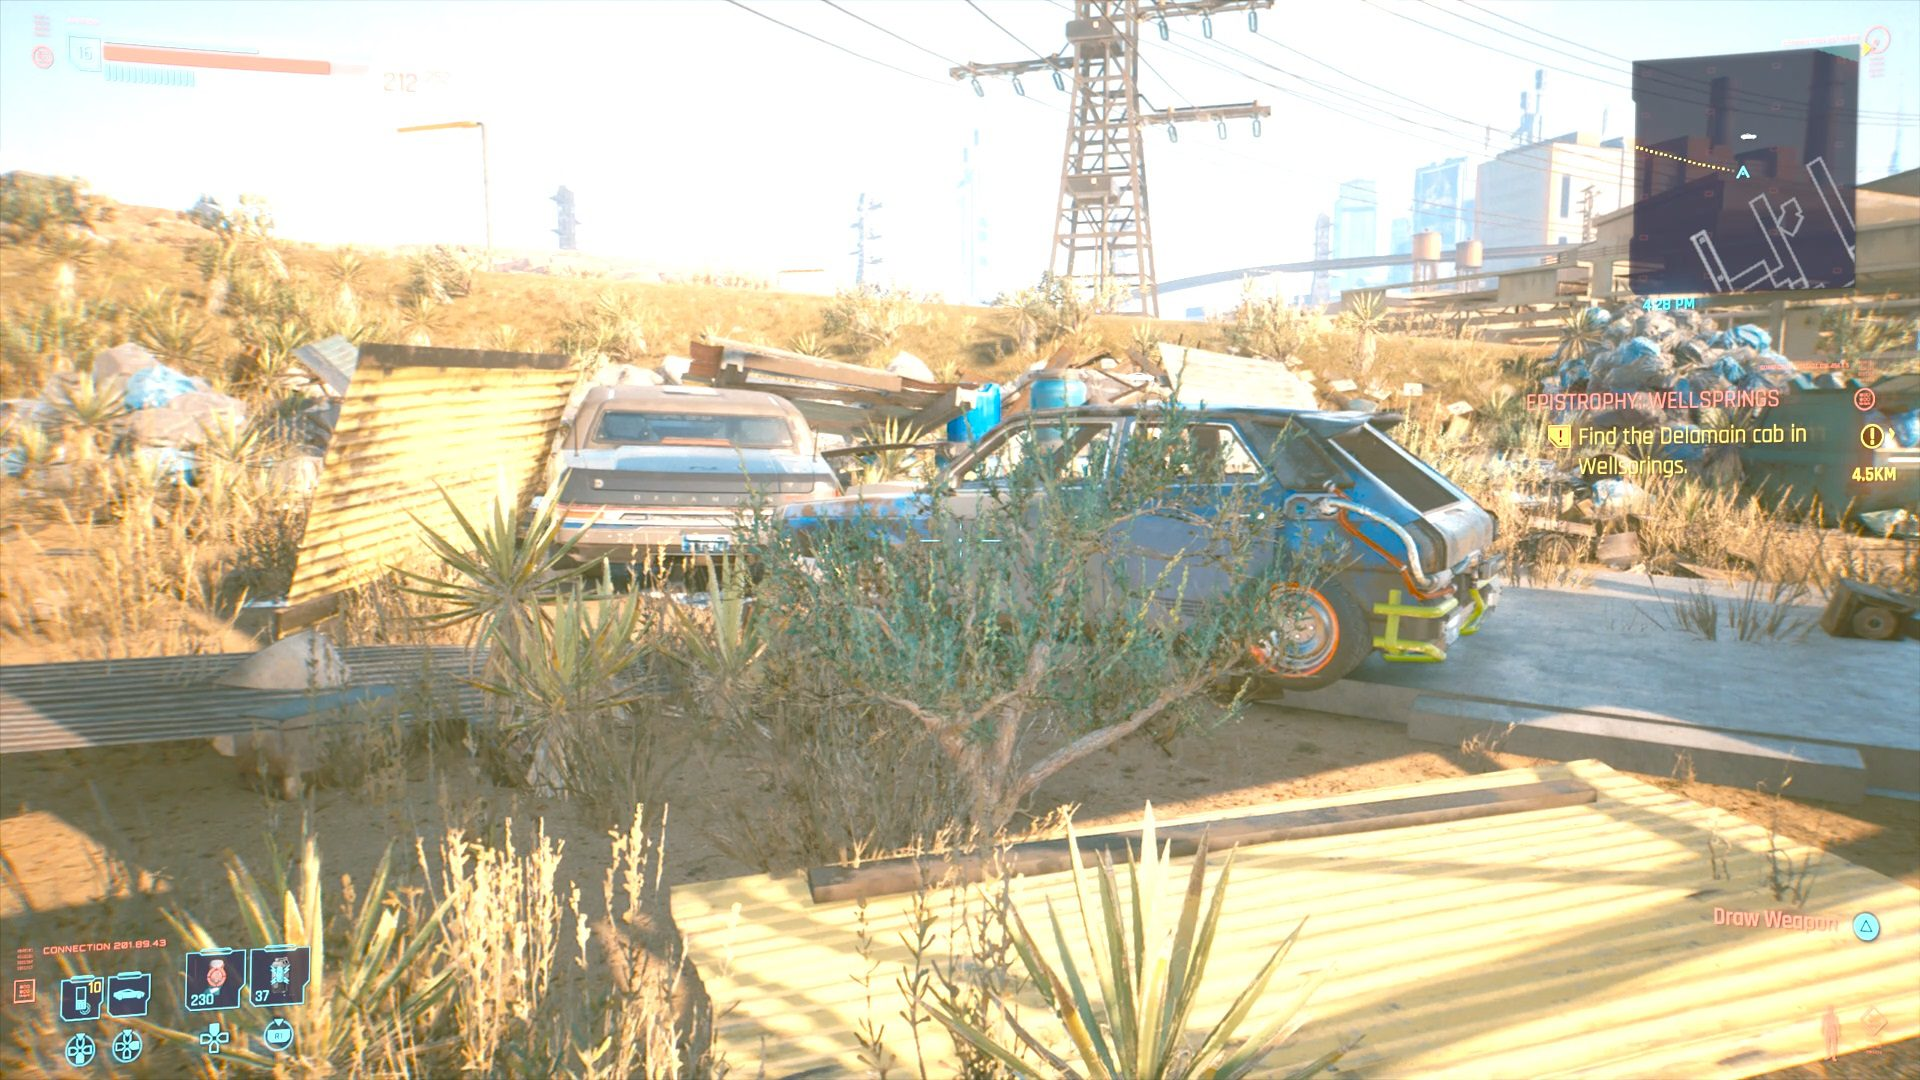 Cyberpunk 2077 Hidden Northside Delamain Cab